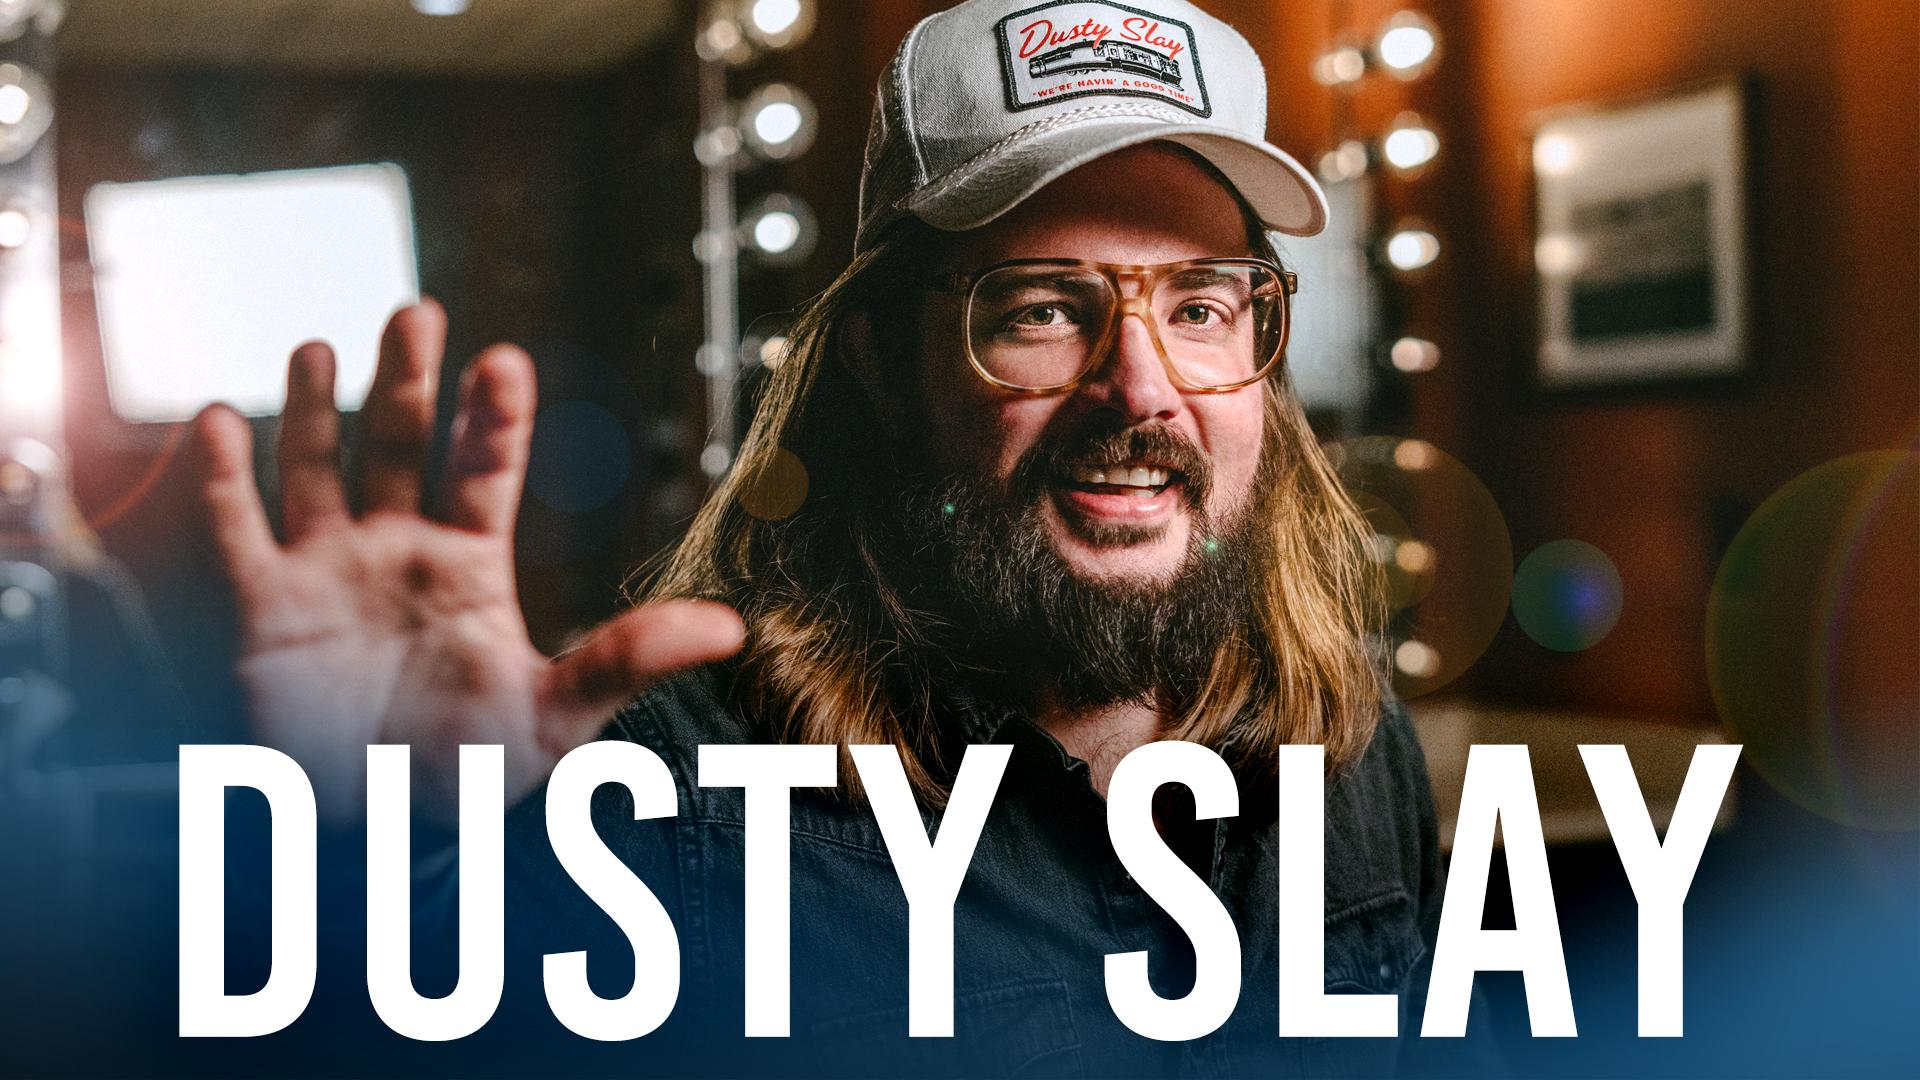 Dusty Slay - PopCulture.com Exclusive Interview screen capture